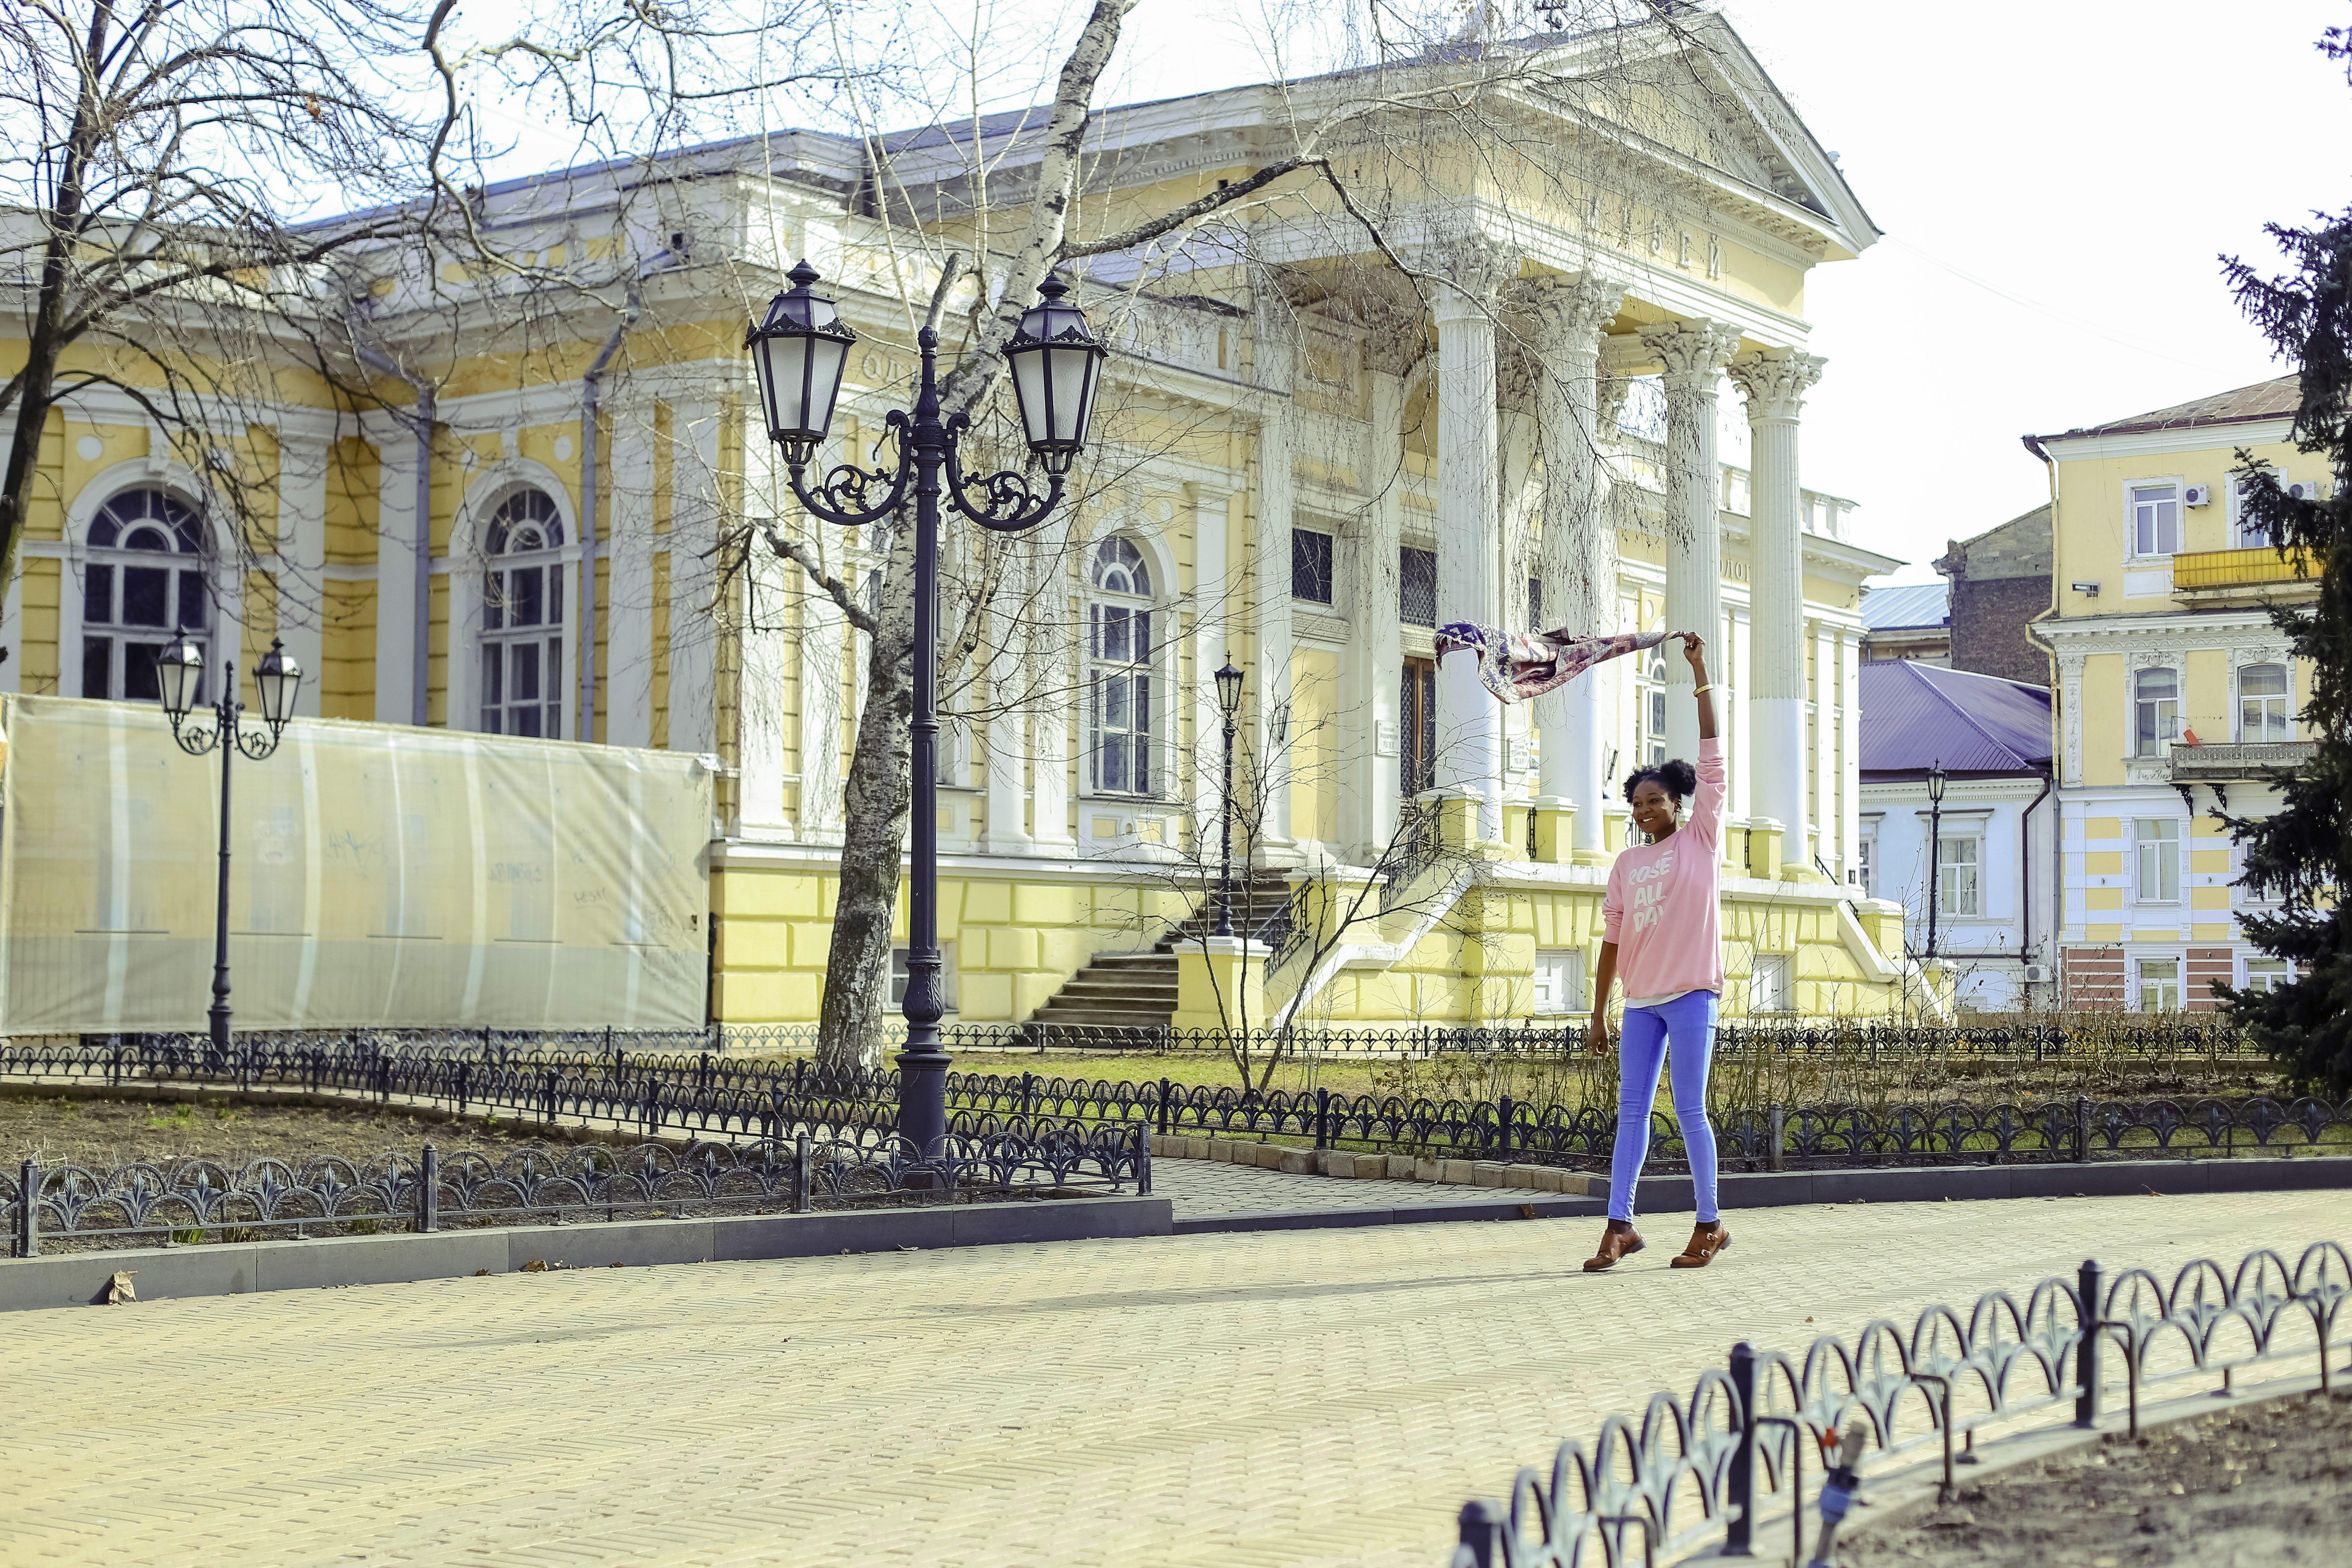 Girl Wearing Pink Long-sleeved Shirt and Blue Pants at Street